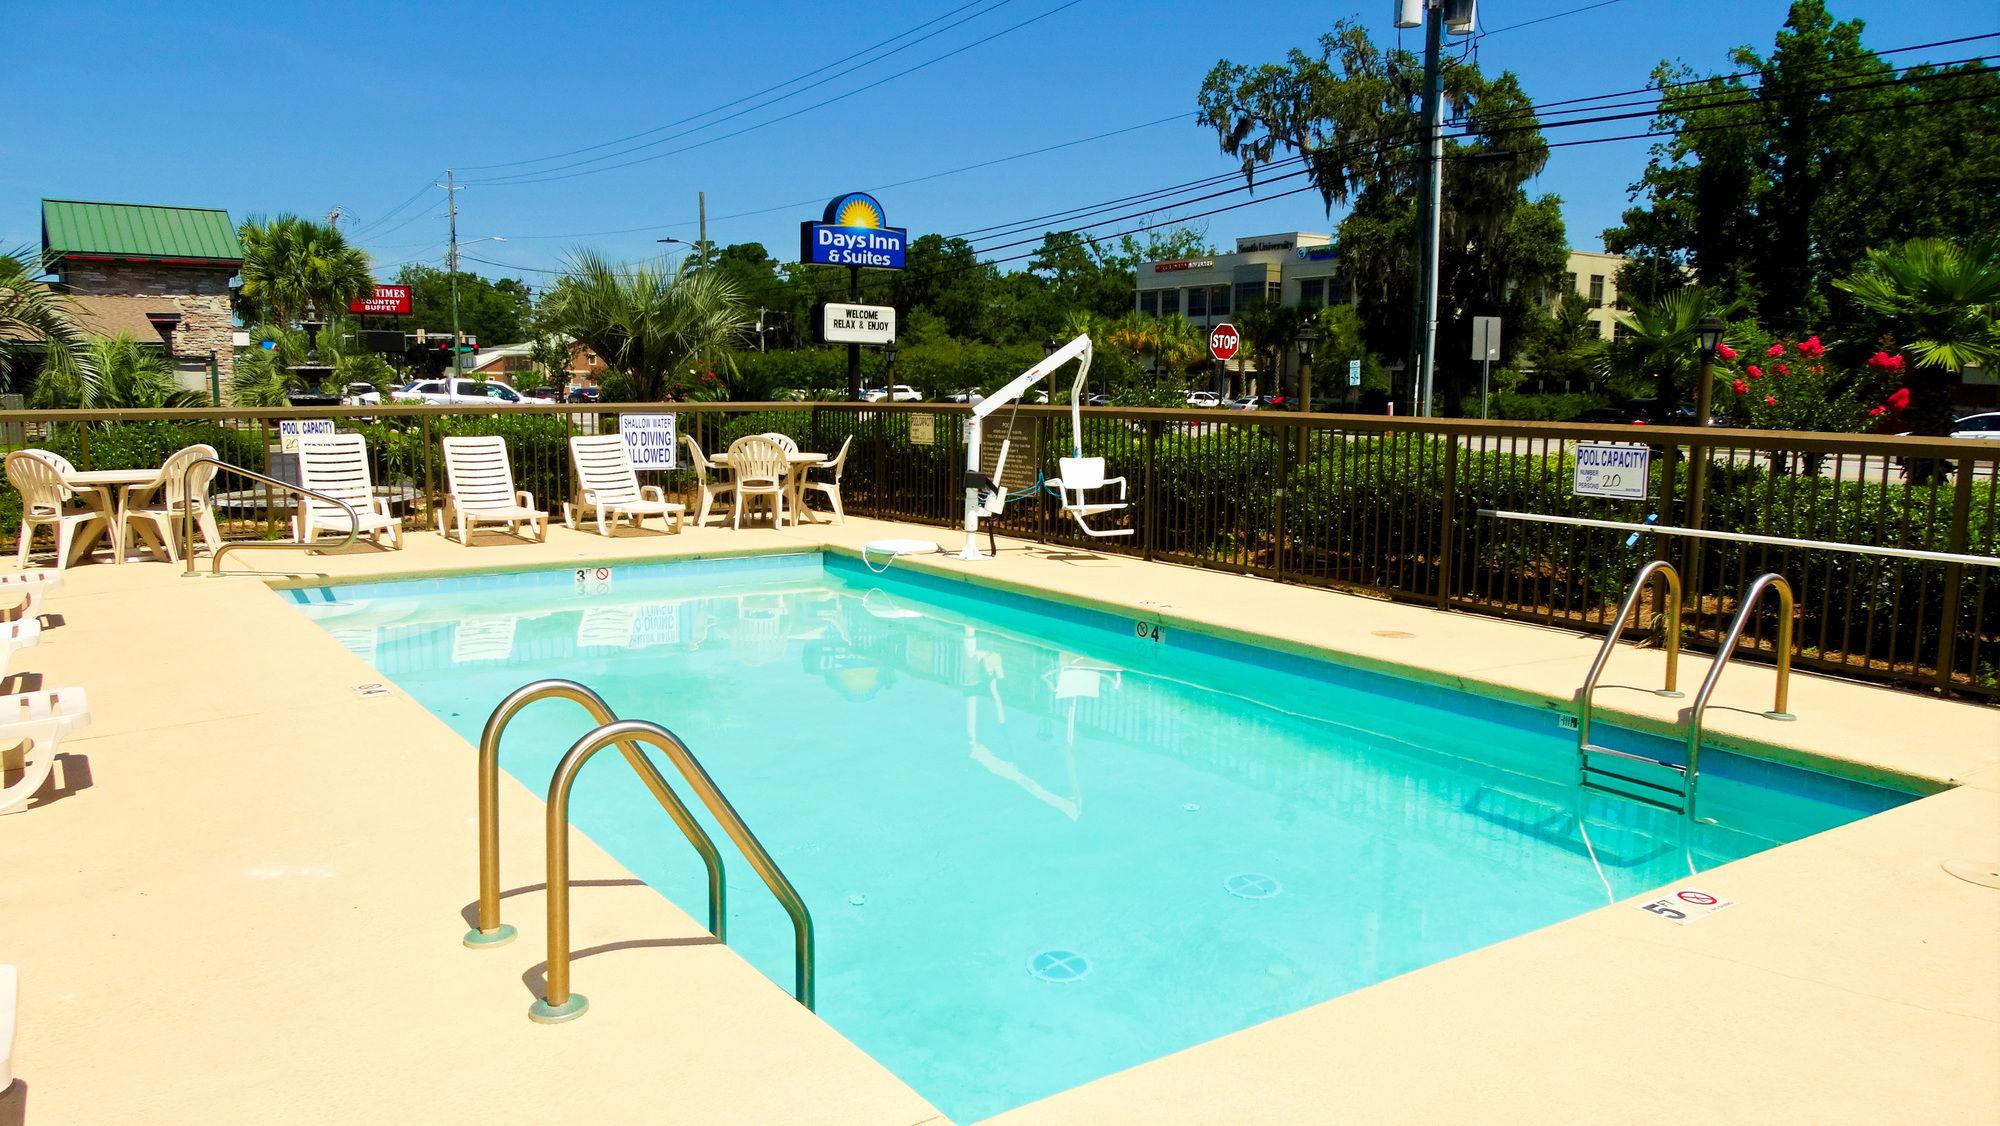 Days Inn and Suites Savannah Midtown in Savannah, GA